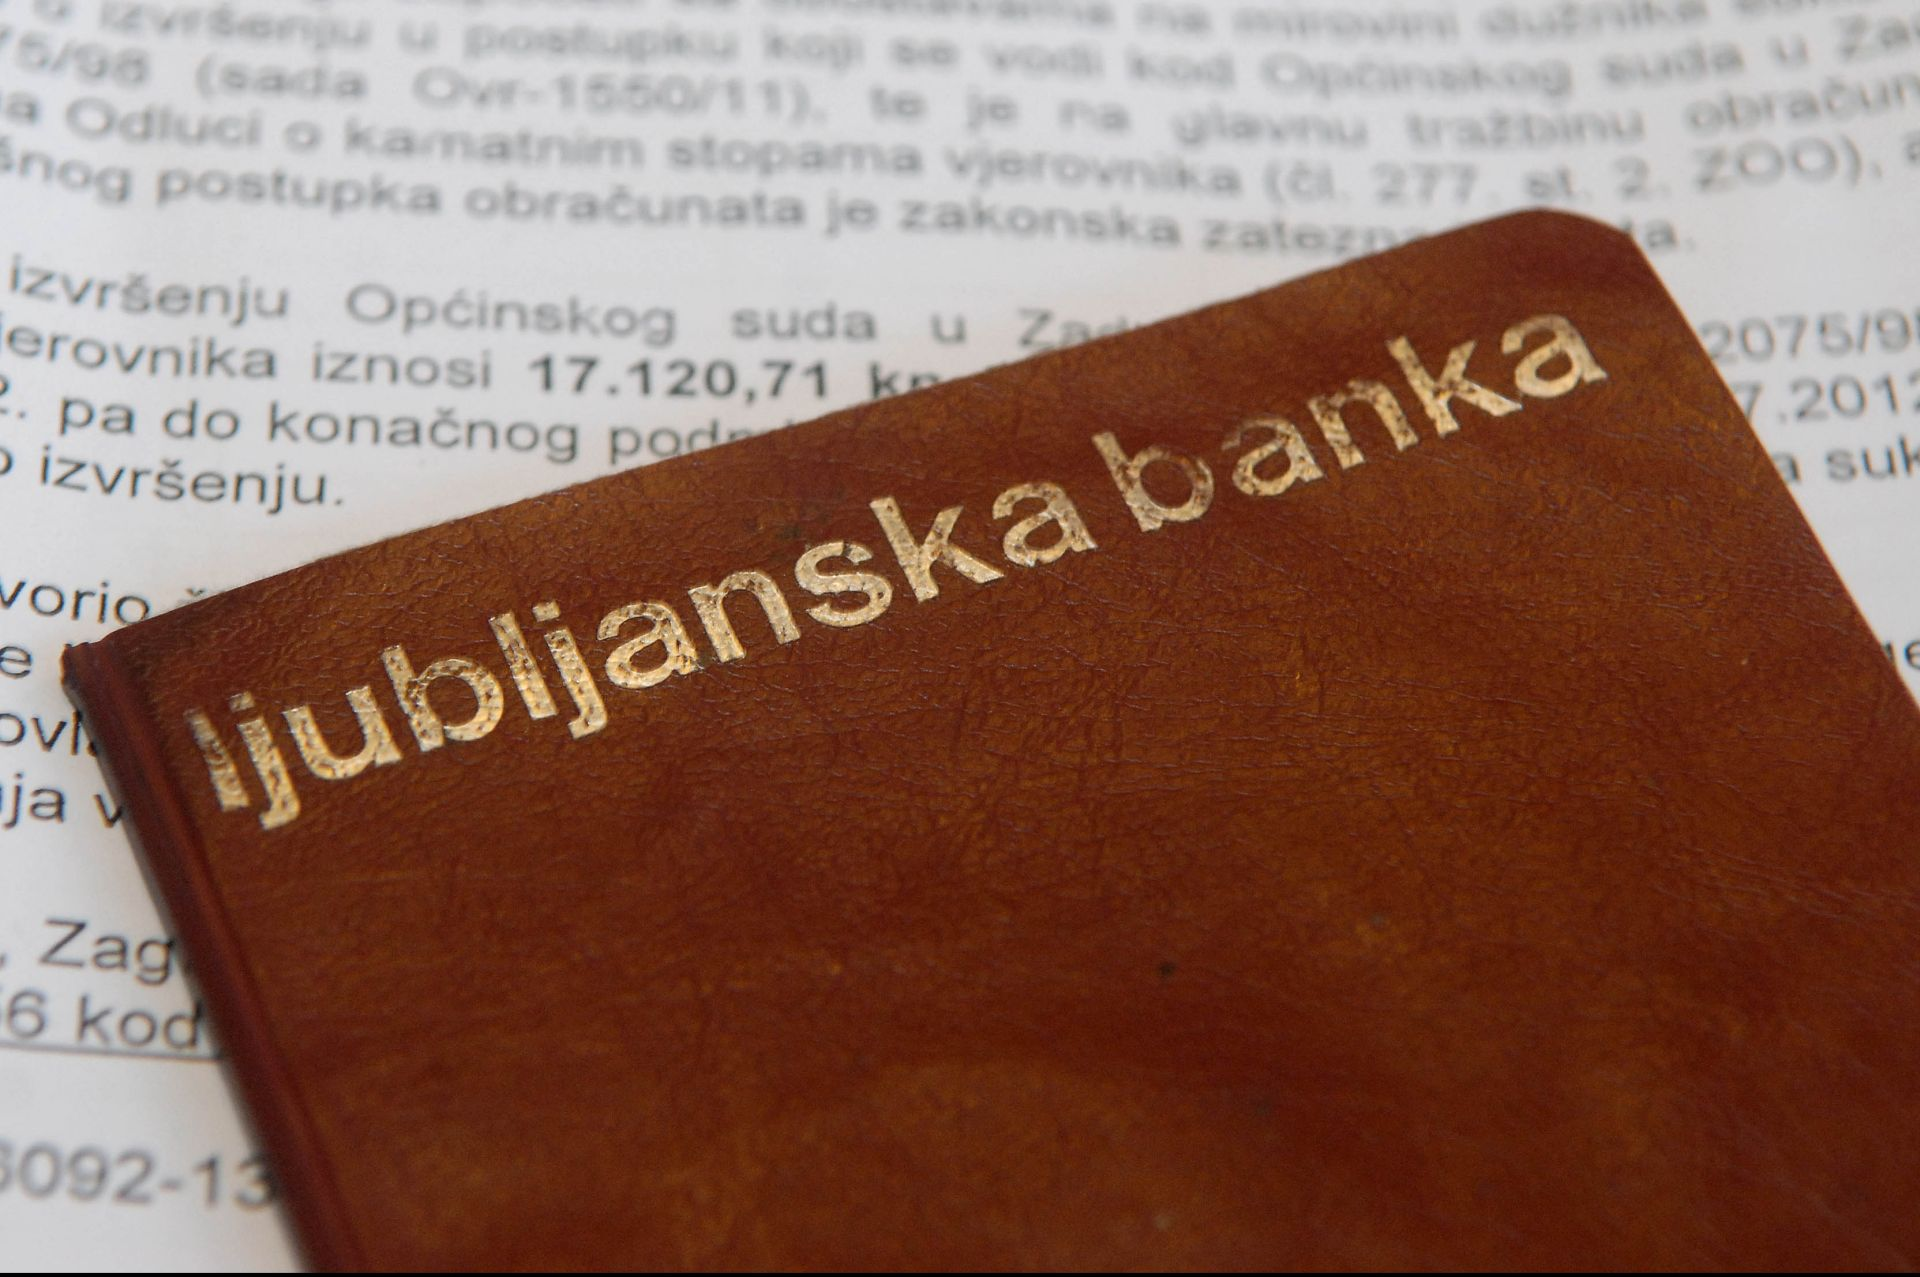 KRAJ DISKRIMINACIJE NESLOVENSKIH ŠTEDIŠA Slovenski parlament prihvatio zakon o staroj štednji LB-a